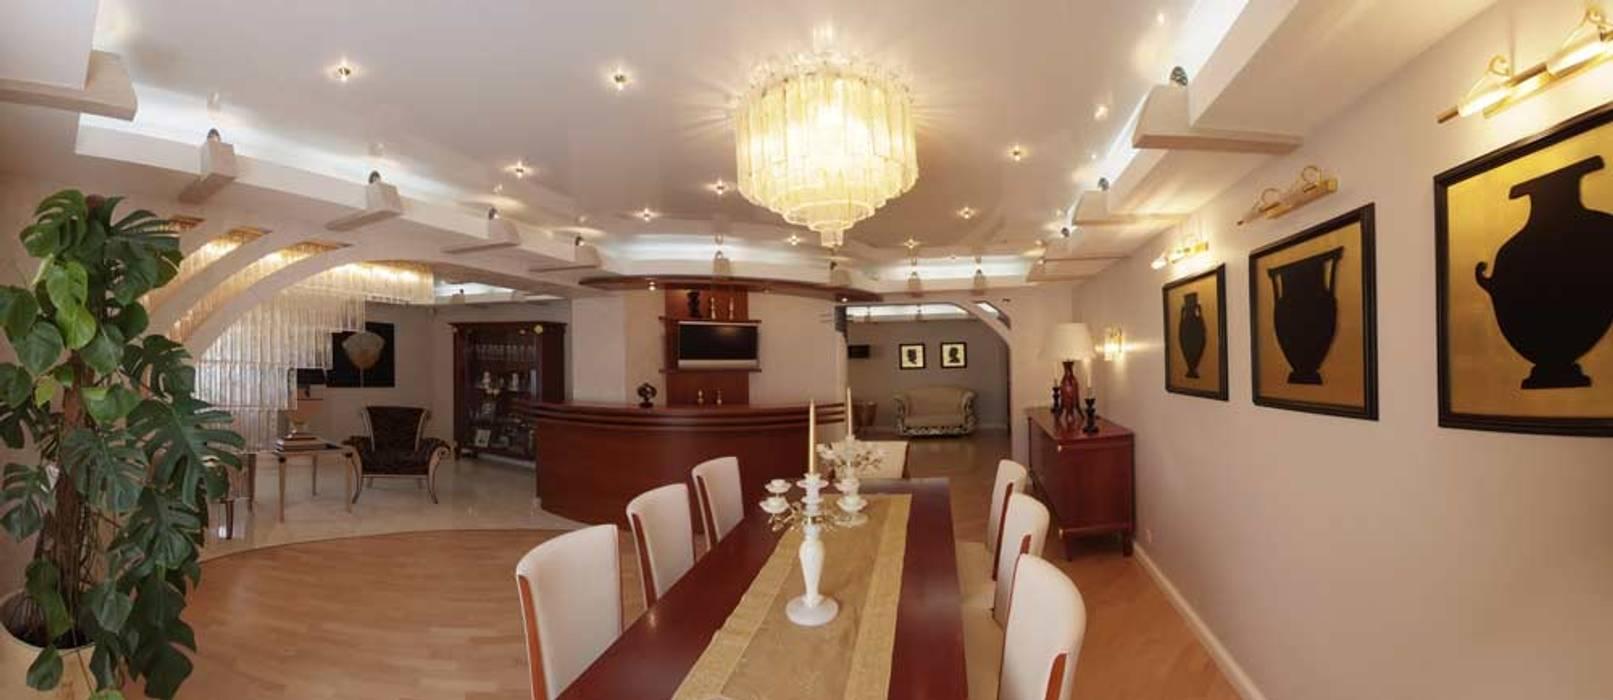 Salon de style  par Архитектурно-дизайнерская студия Александра Шереметьева, Classique